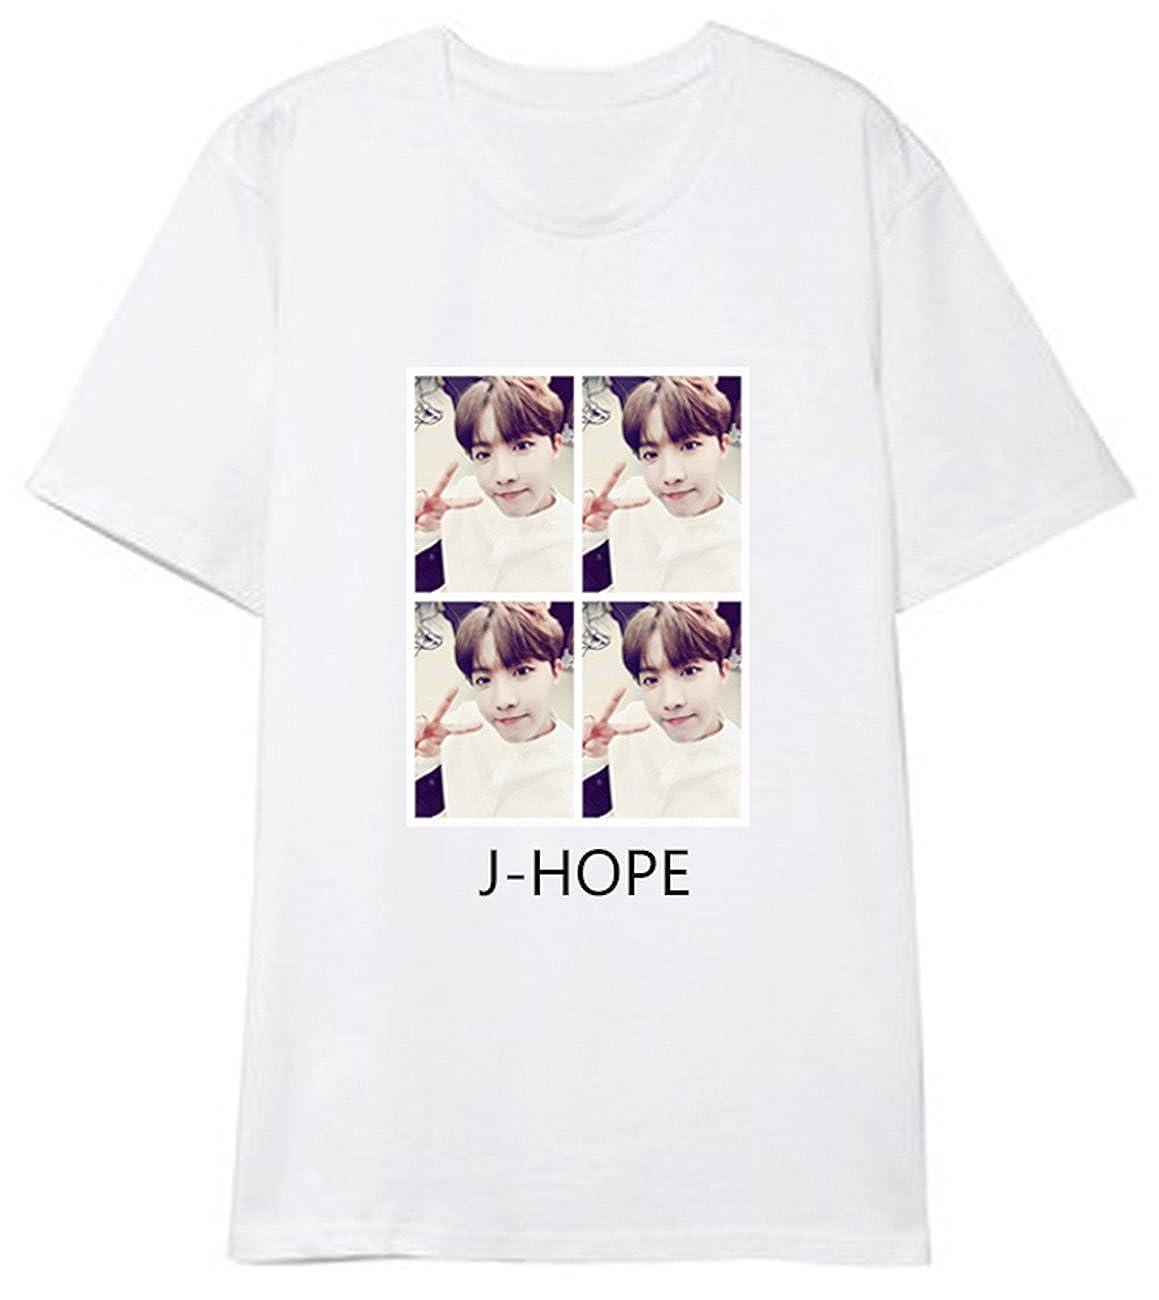 SERAPHY Unisex Kpop Bangtan Boys Shirt BTS Photo T-Shirt